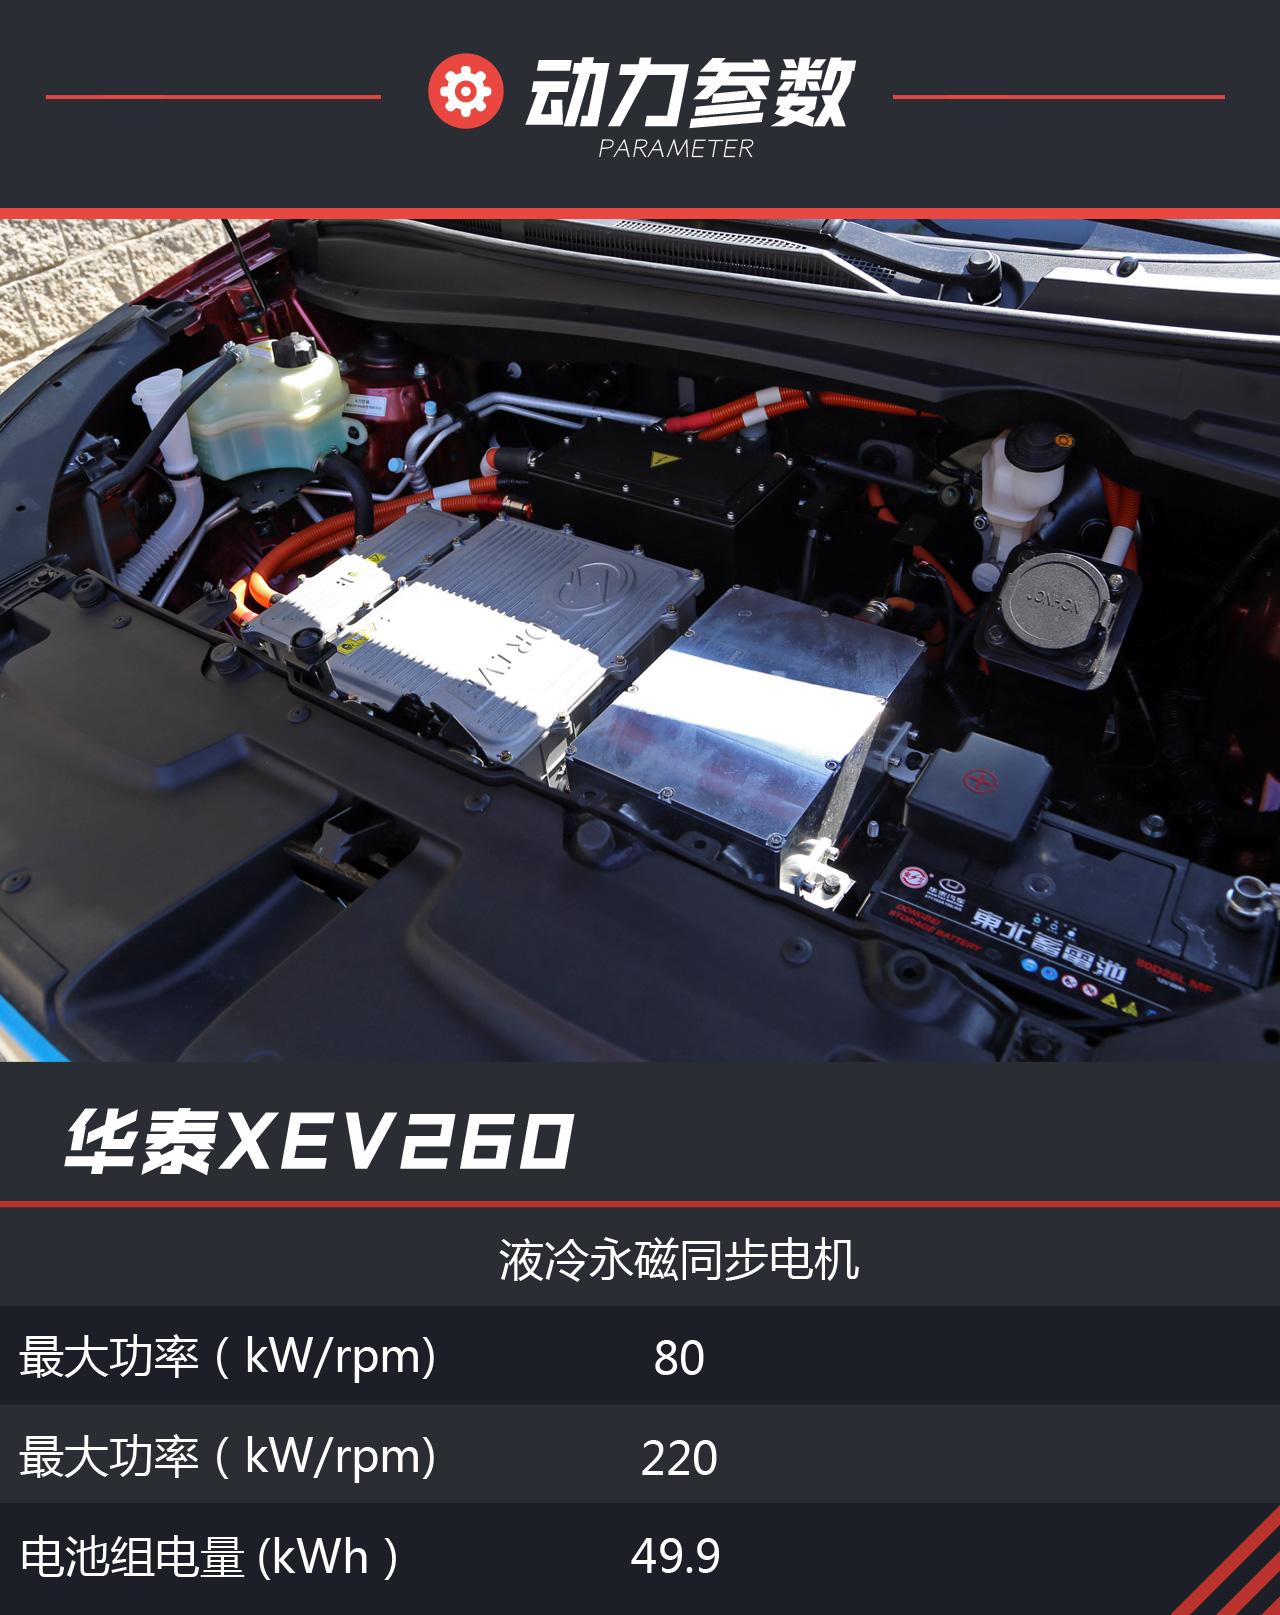 XEV260静态体验